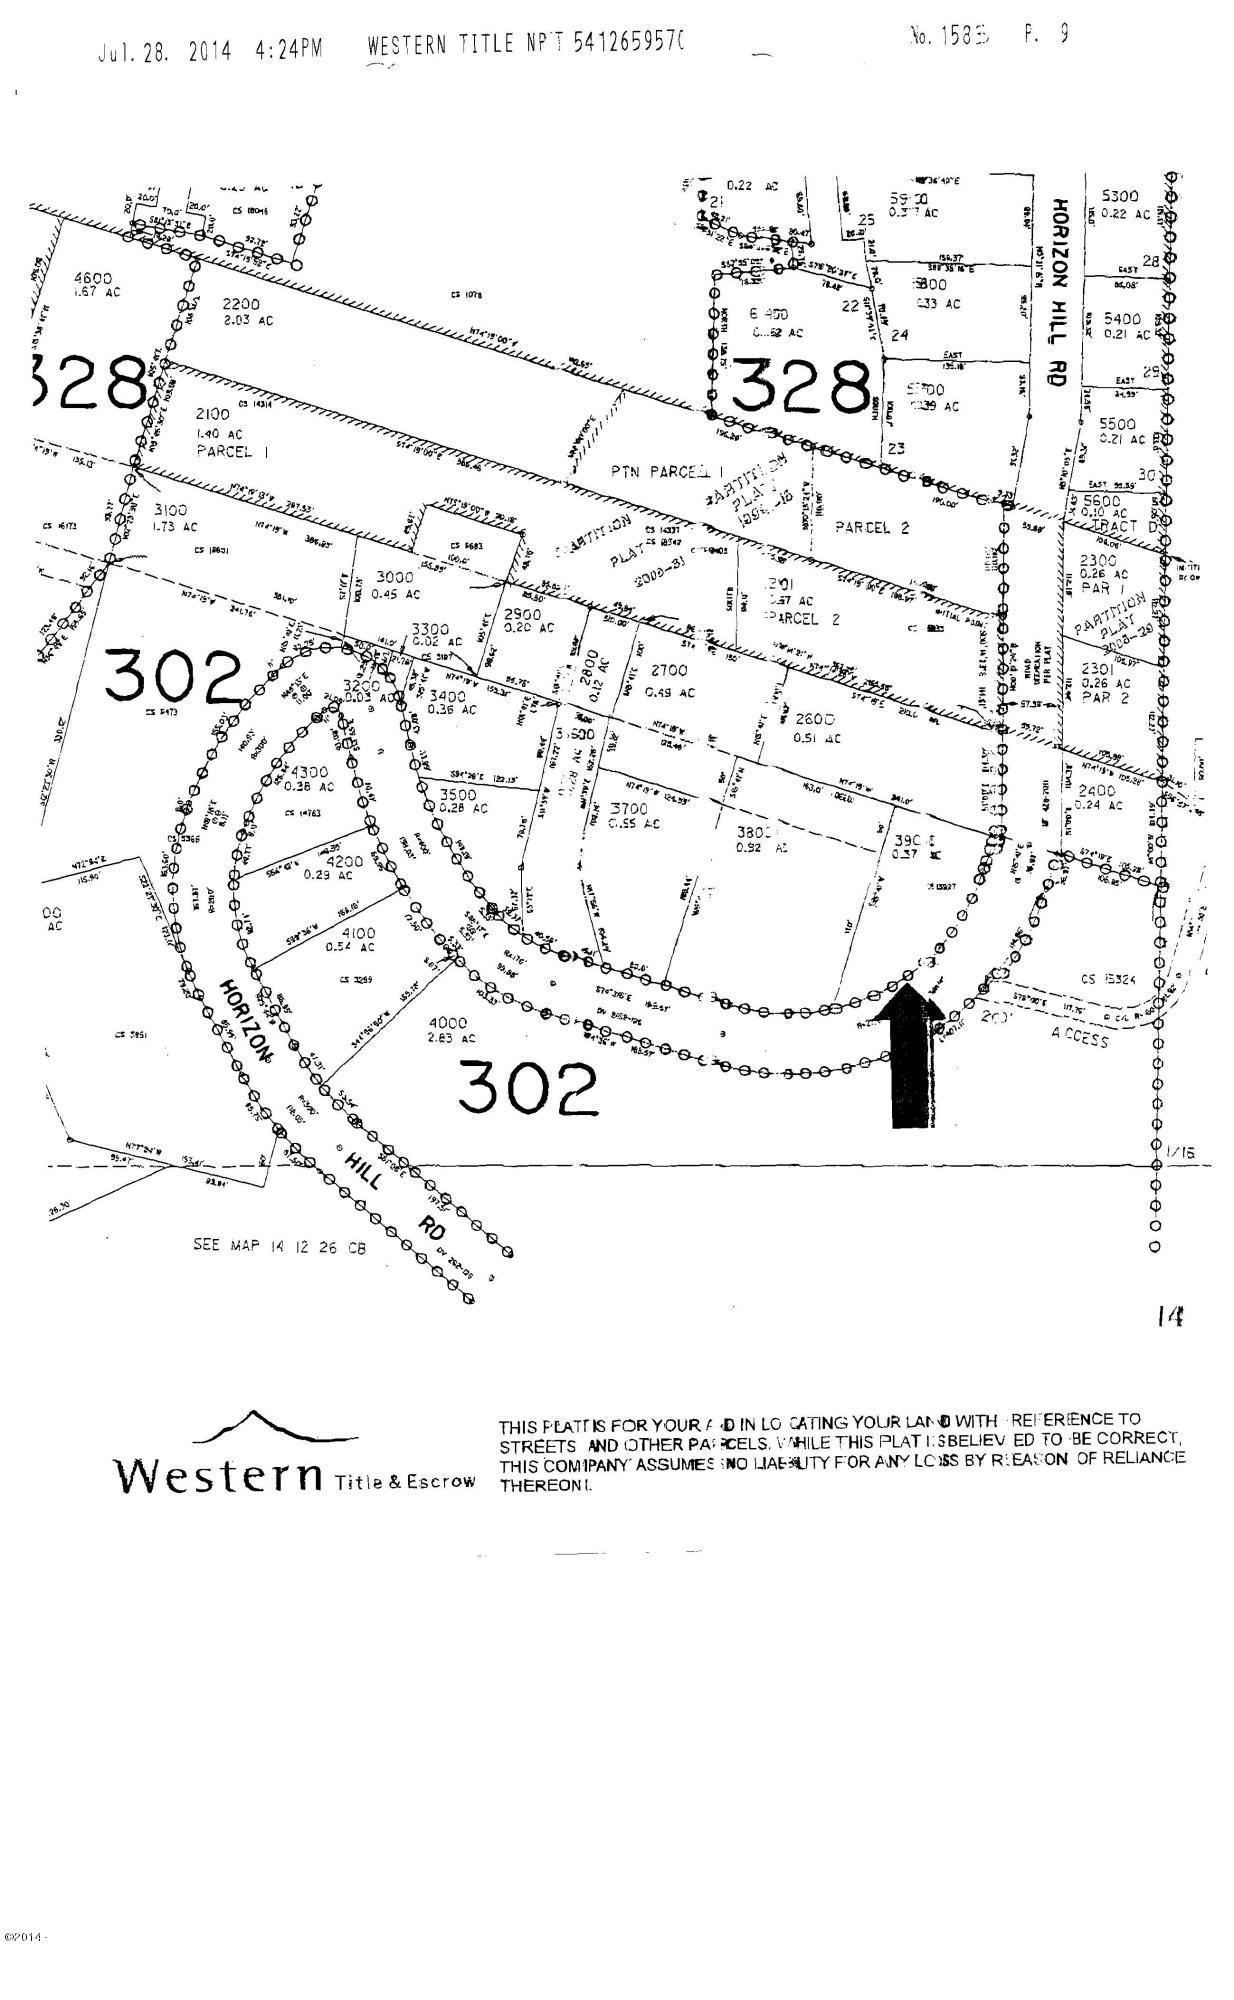 893 Horizon Hill Rd, Yachats, OR 97498 - Plat map